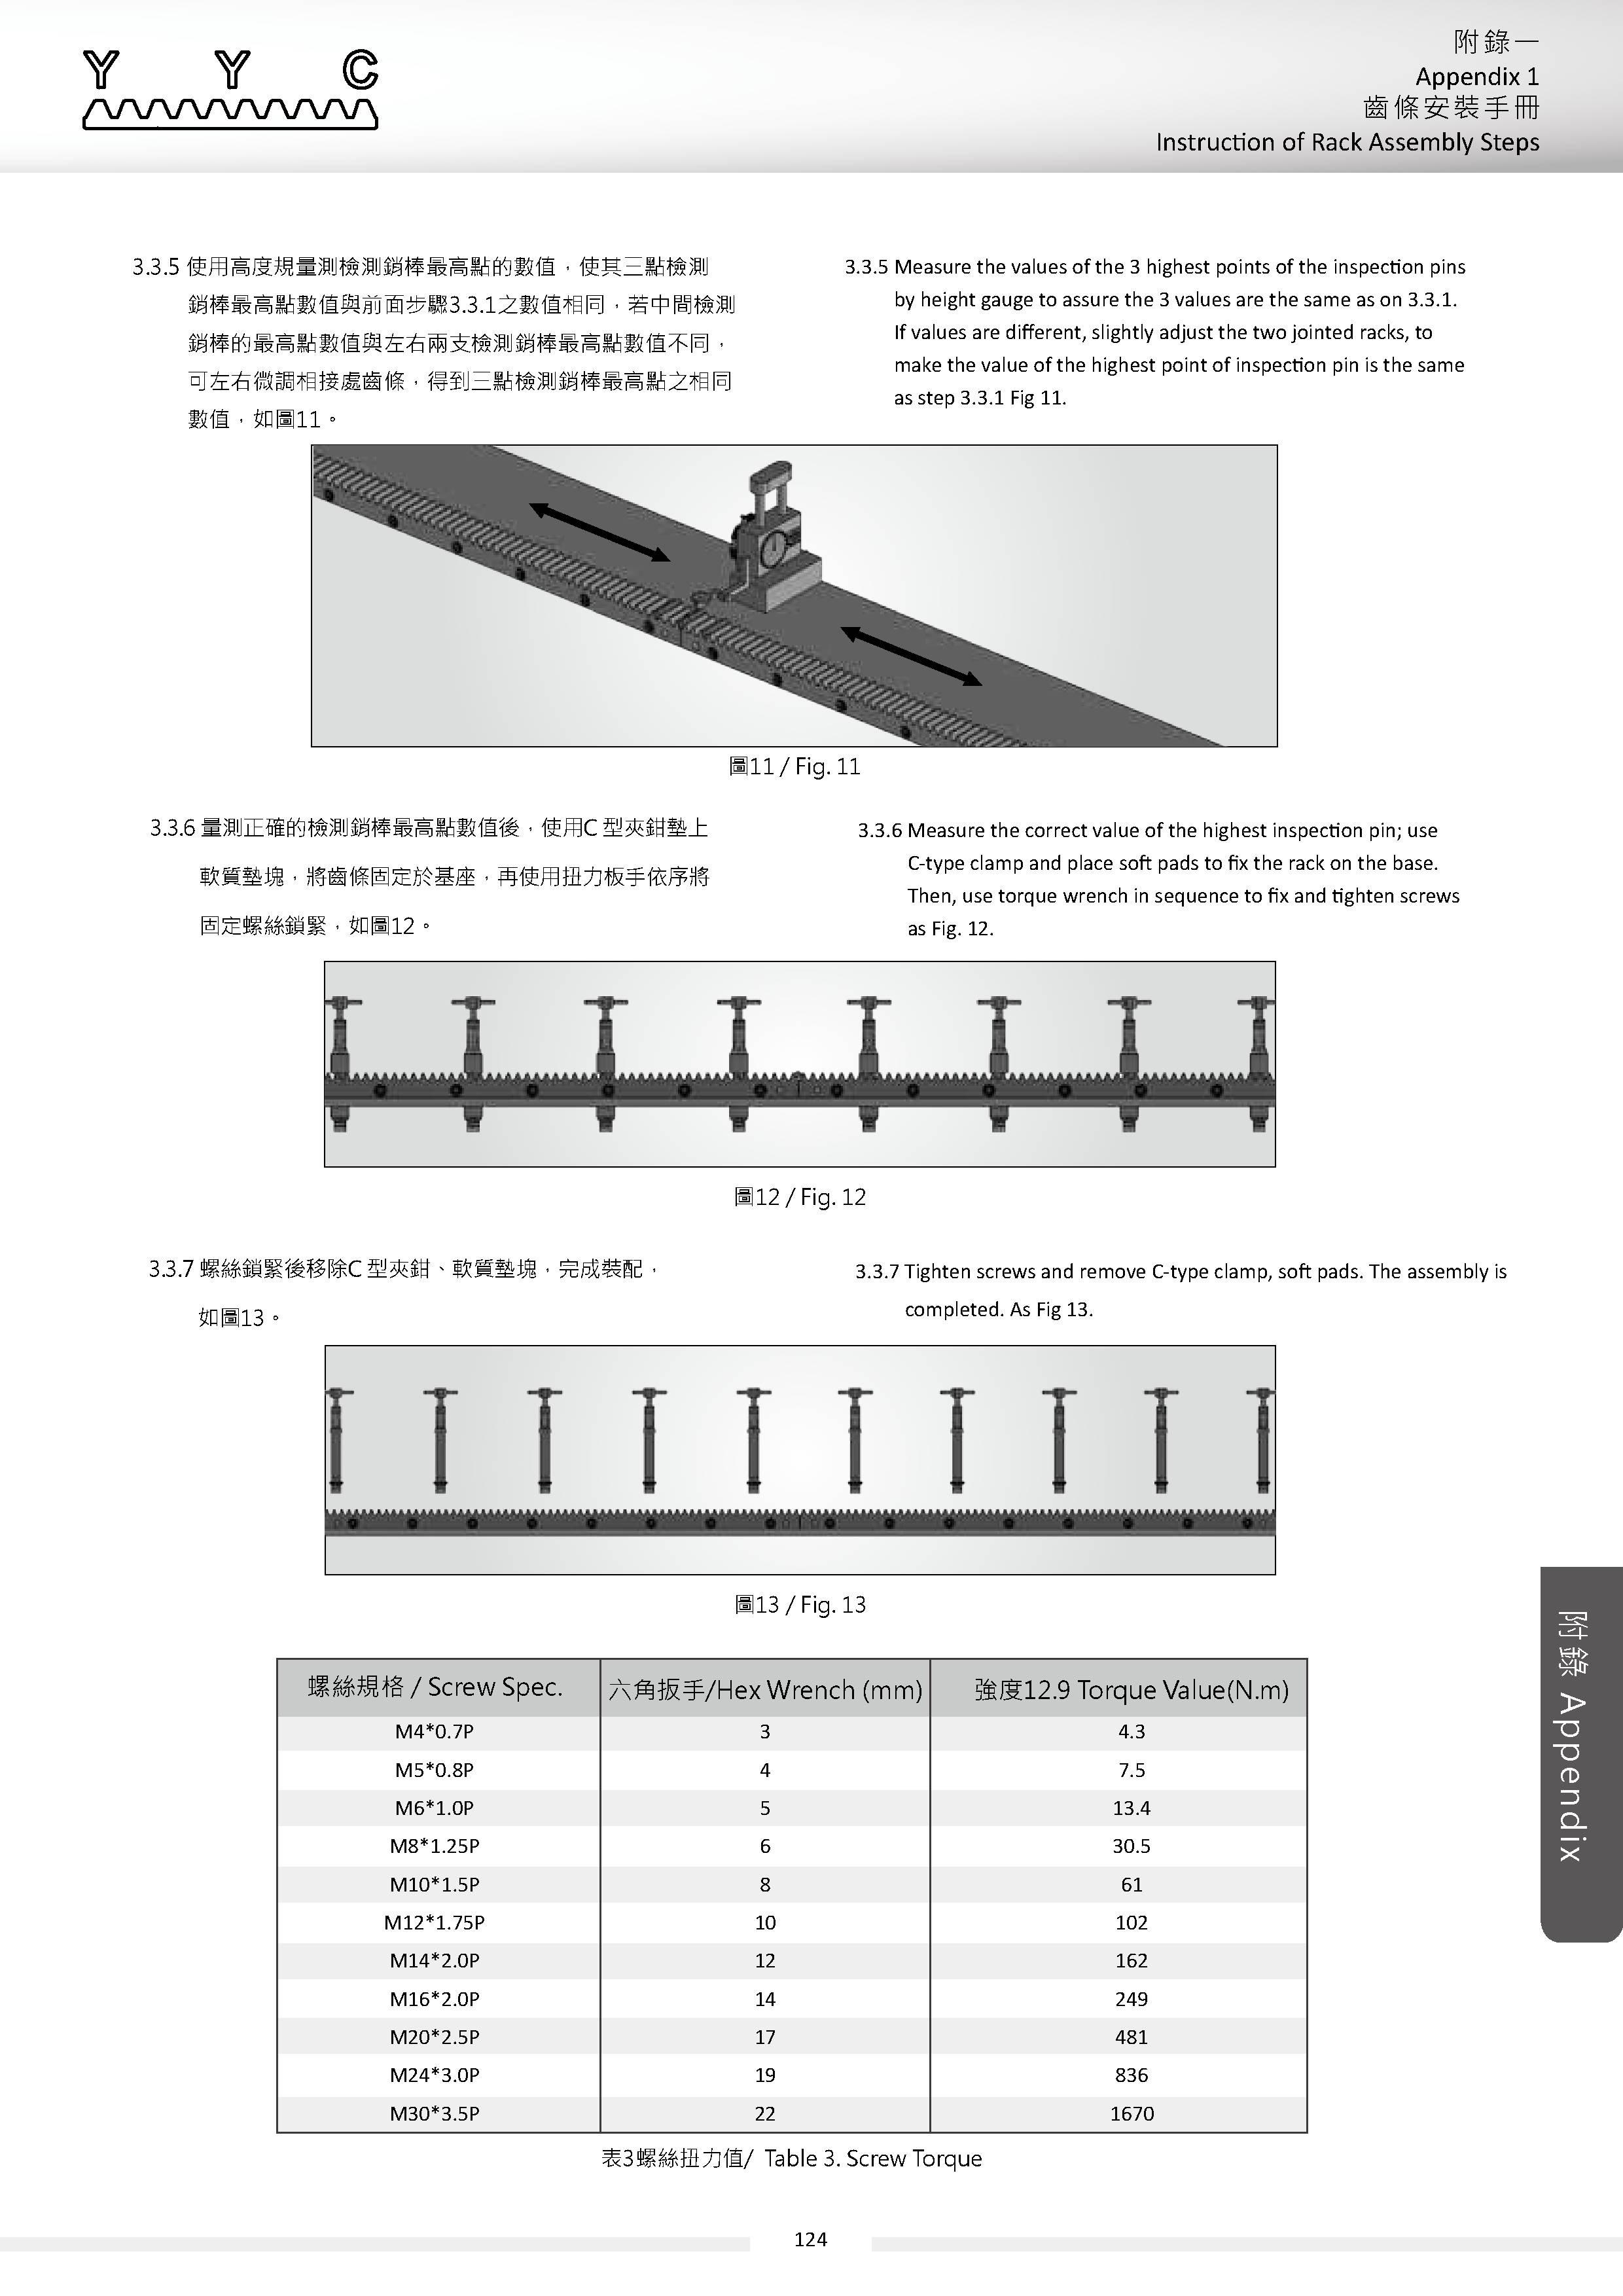 Instruction of Rack Assembly Steps 齒條安裝手冊6